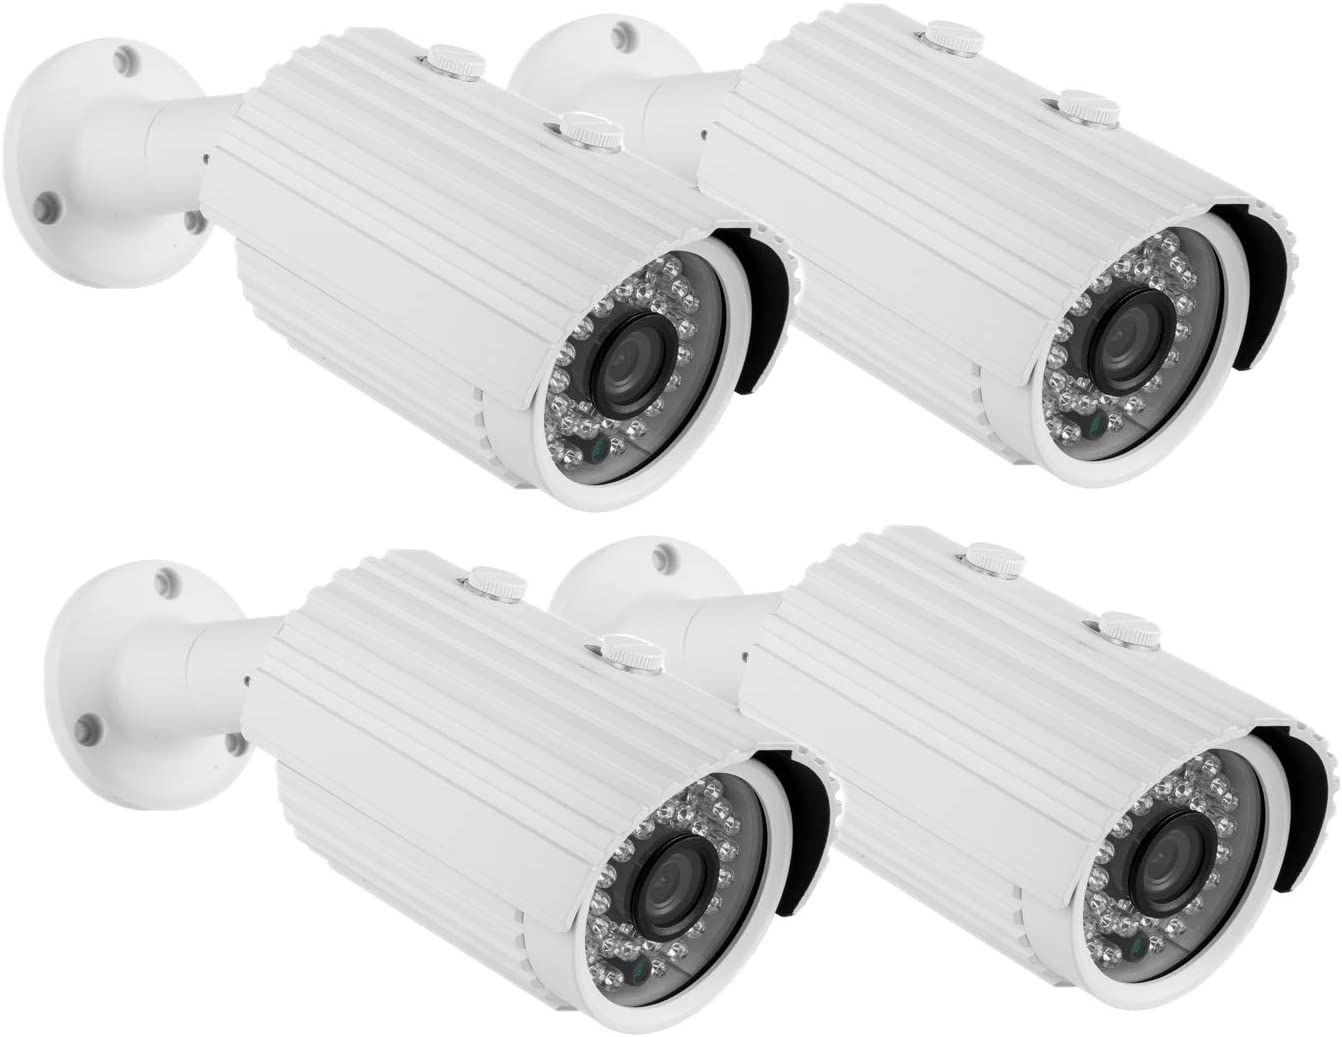 Security Camera CANAVIS AHD CCTV Camera 720P 36PCS IR-LEDs 2.8mm Lens with IR Cut Home Security Day Night Waterproof CCTV Camera- 100ft IR Distance,Indoor Outdoor 2.8mm 4pack